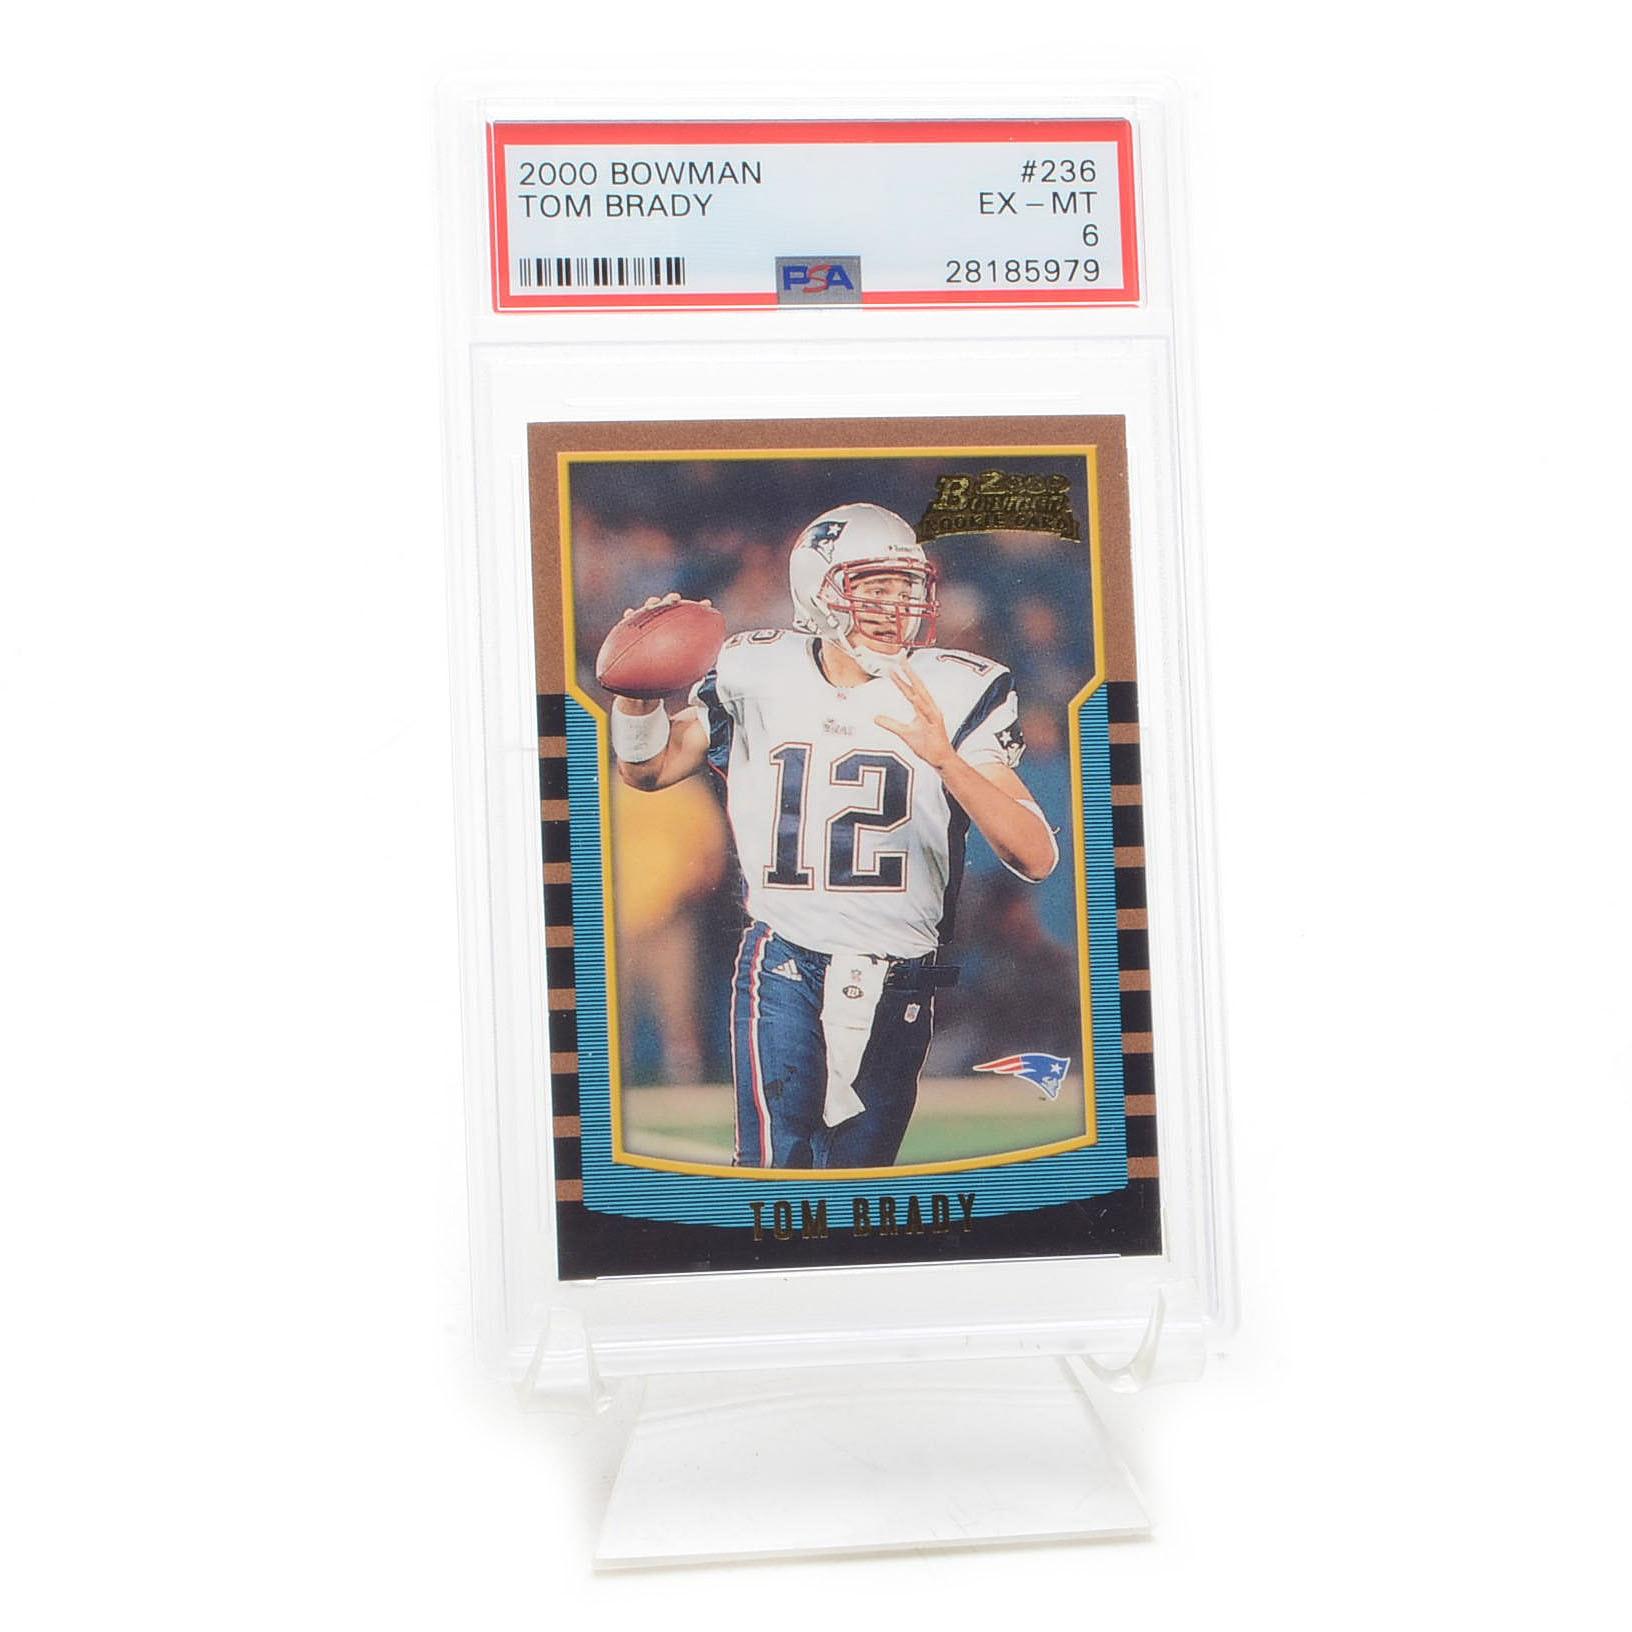 2000 Tom Brady Bowman PSA Graded Rookie Football Card